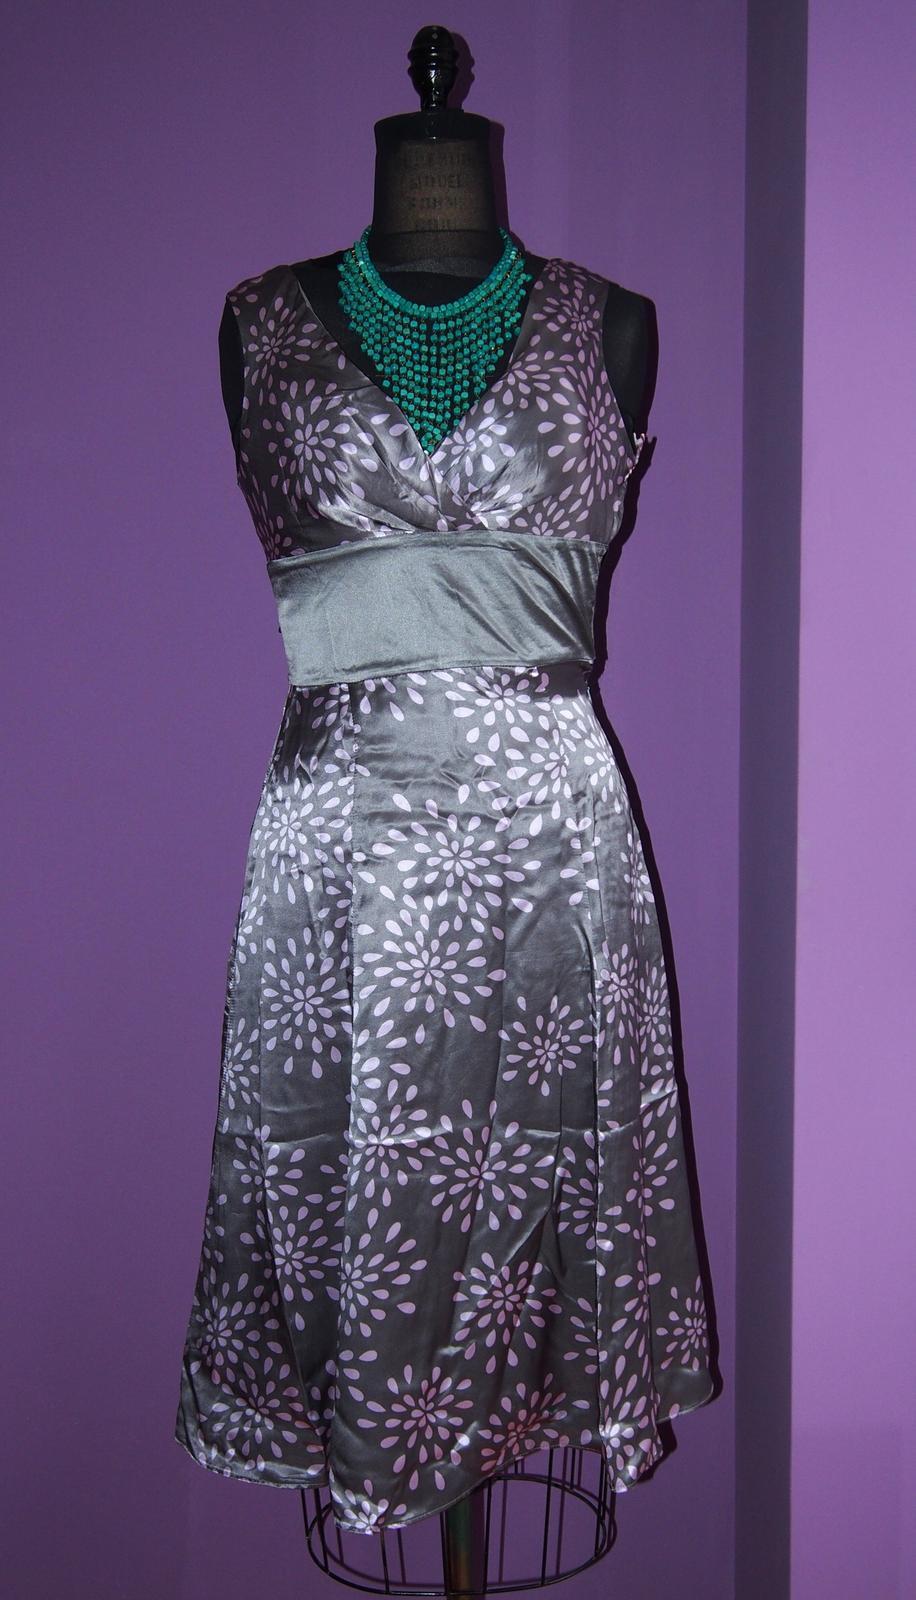 Ted Baker Nežne romantické hodvábne šaty PC140eur - Obrázok č. 4